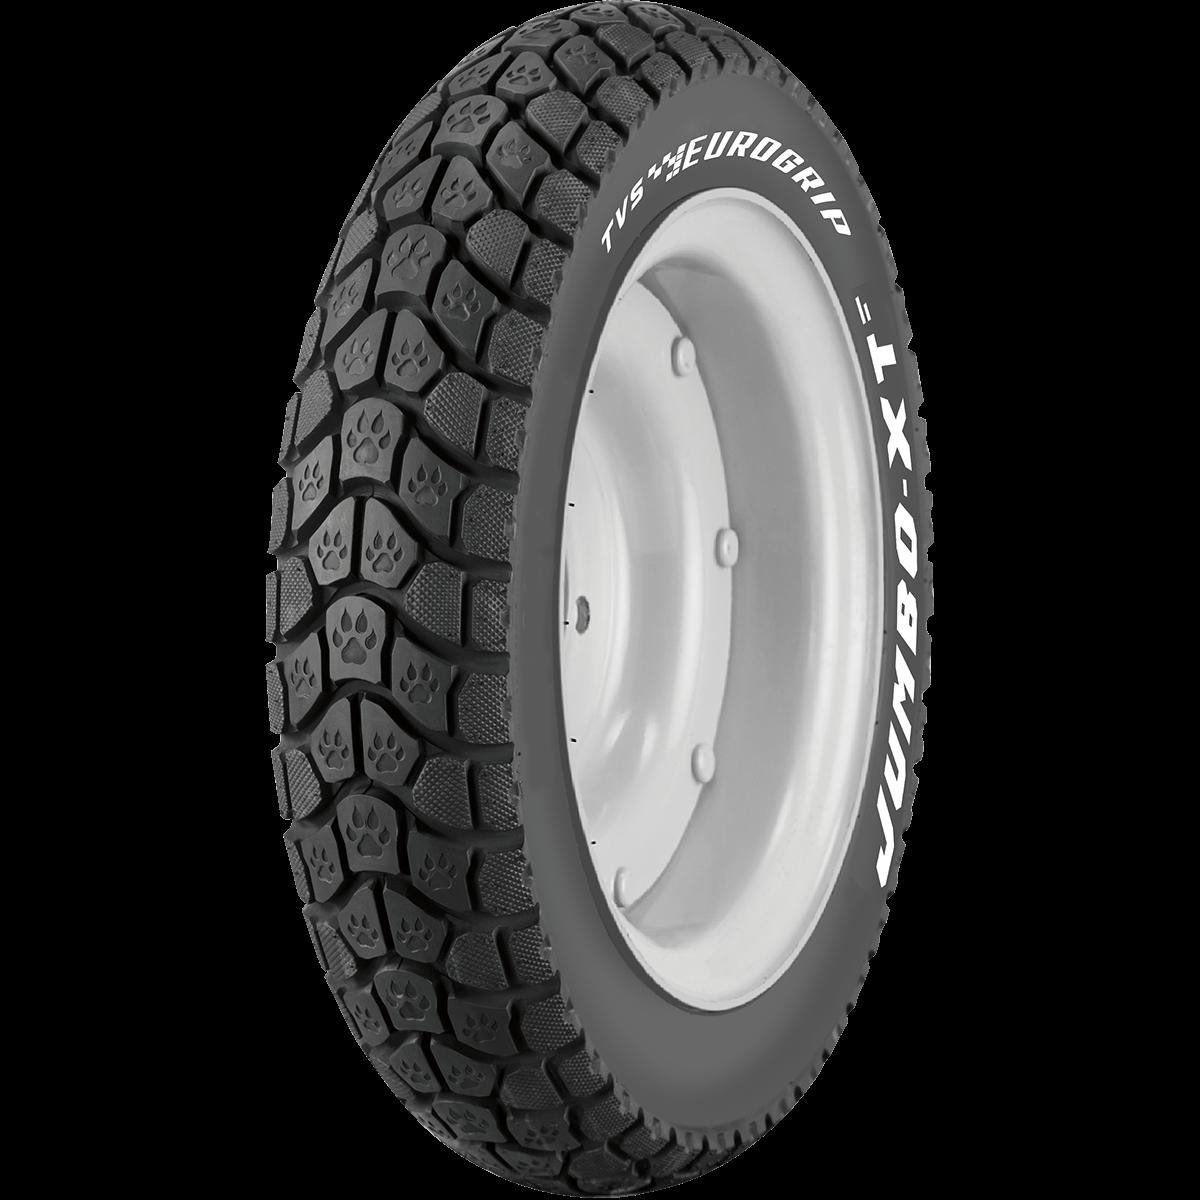 TVS Jumbo_XT 90/100 10 Tubeless 53 J Front/Rear Two-Wheeler Tyre